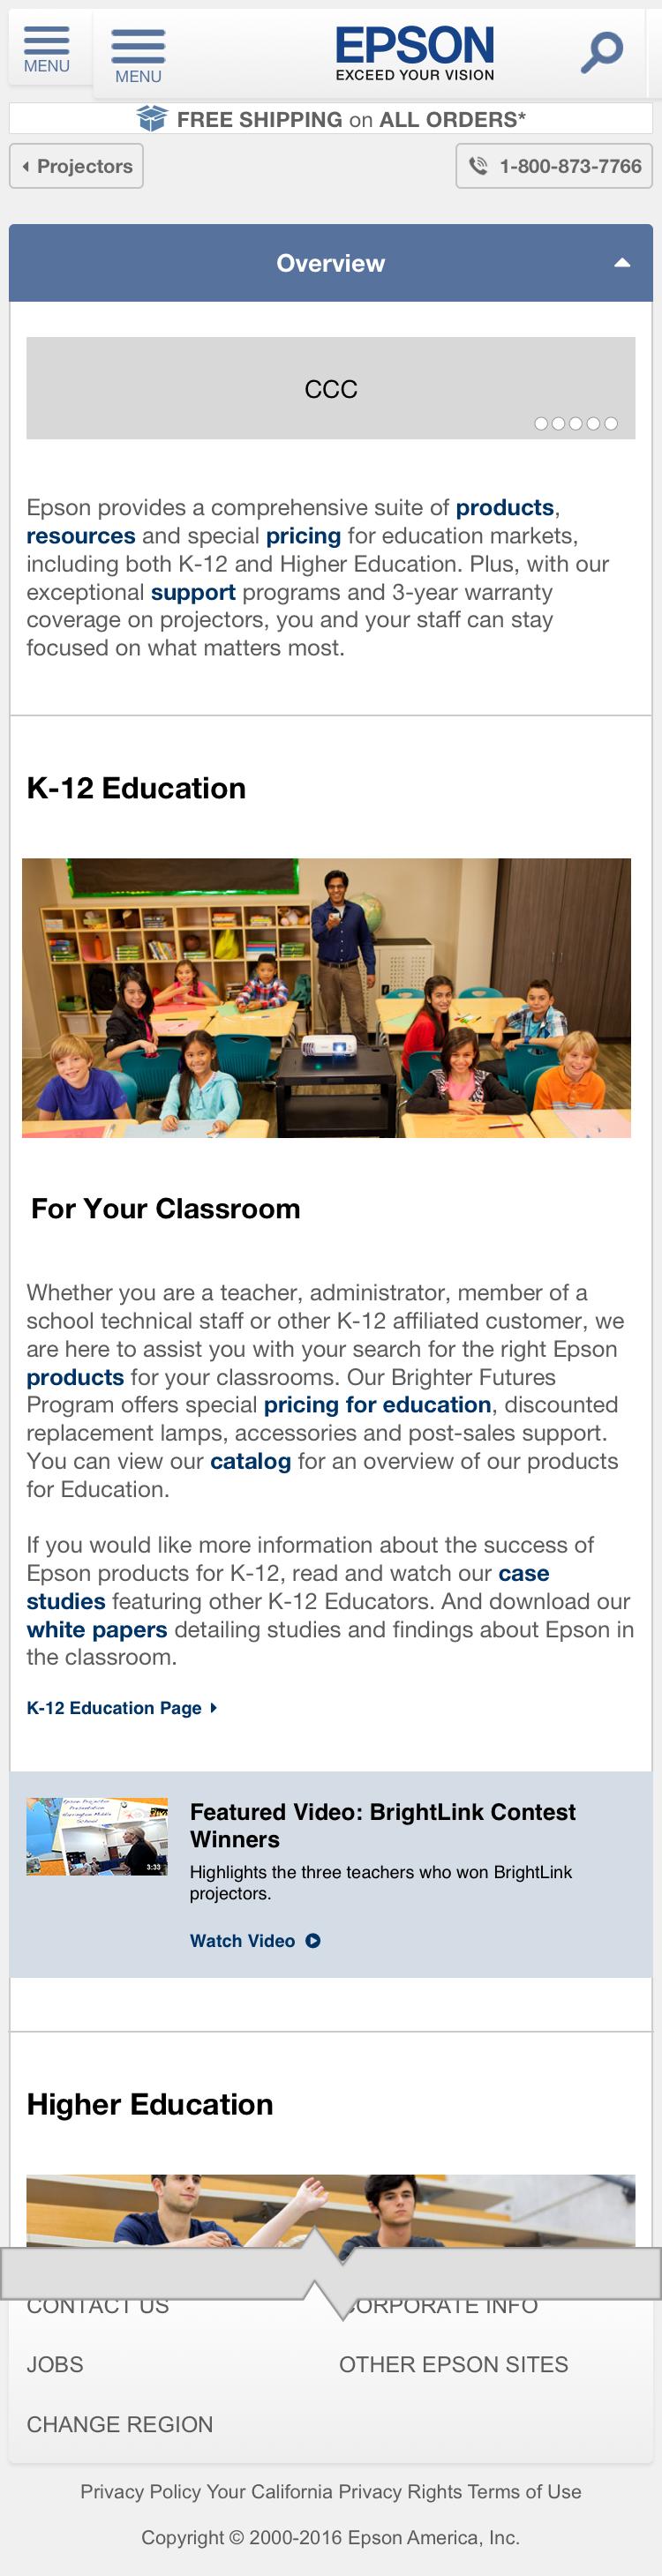 Education Projectors - Overview